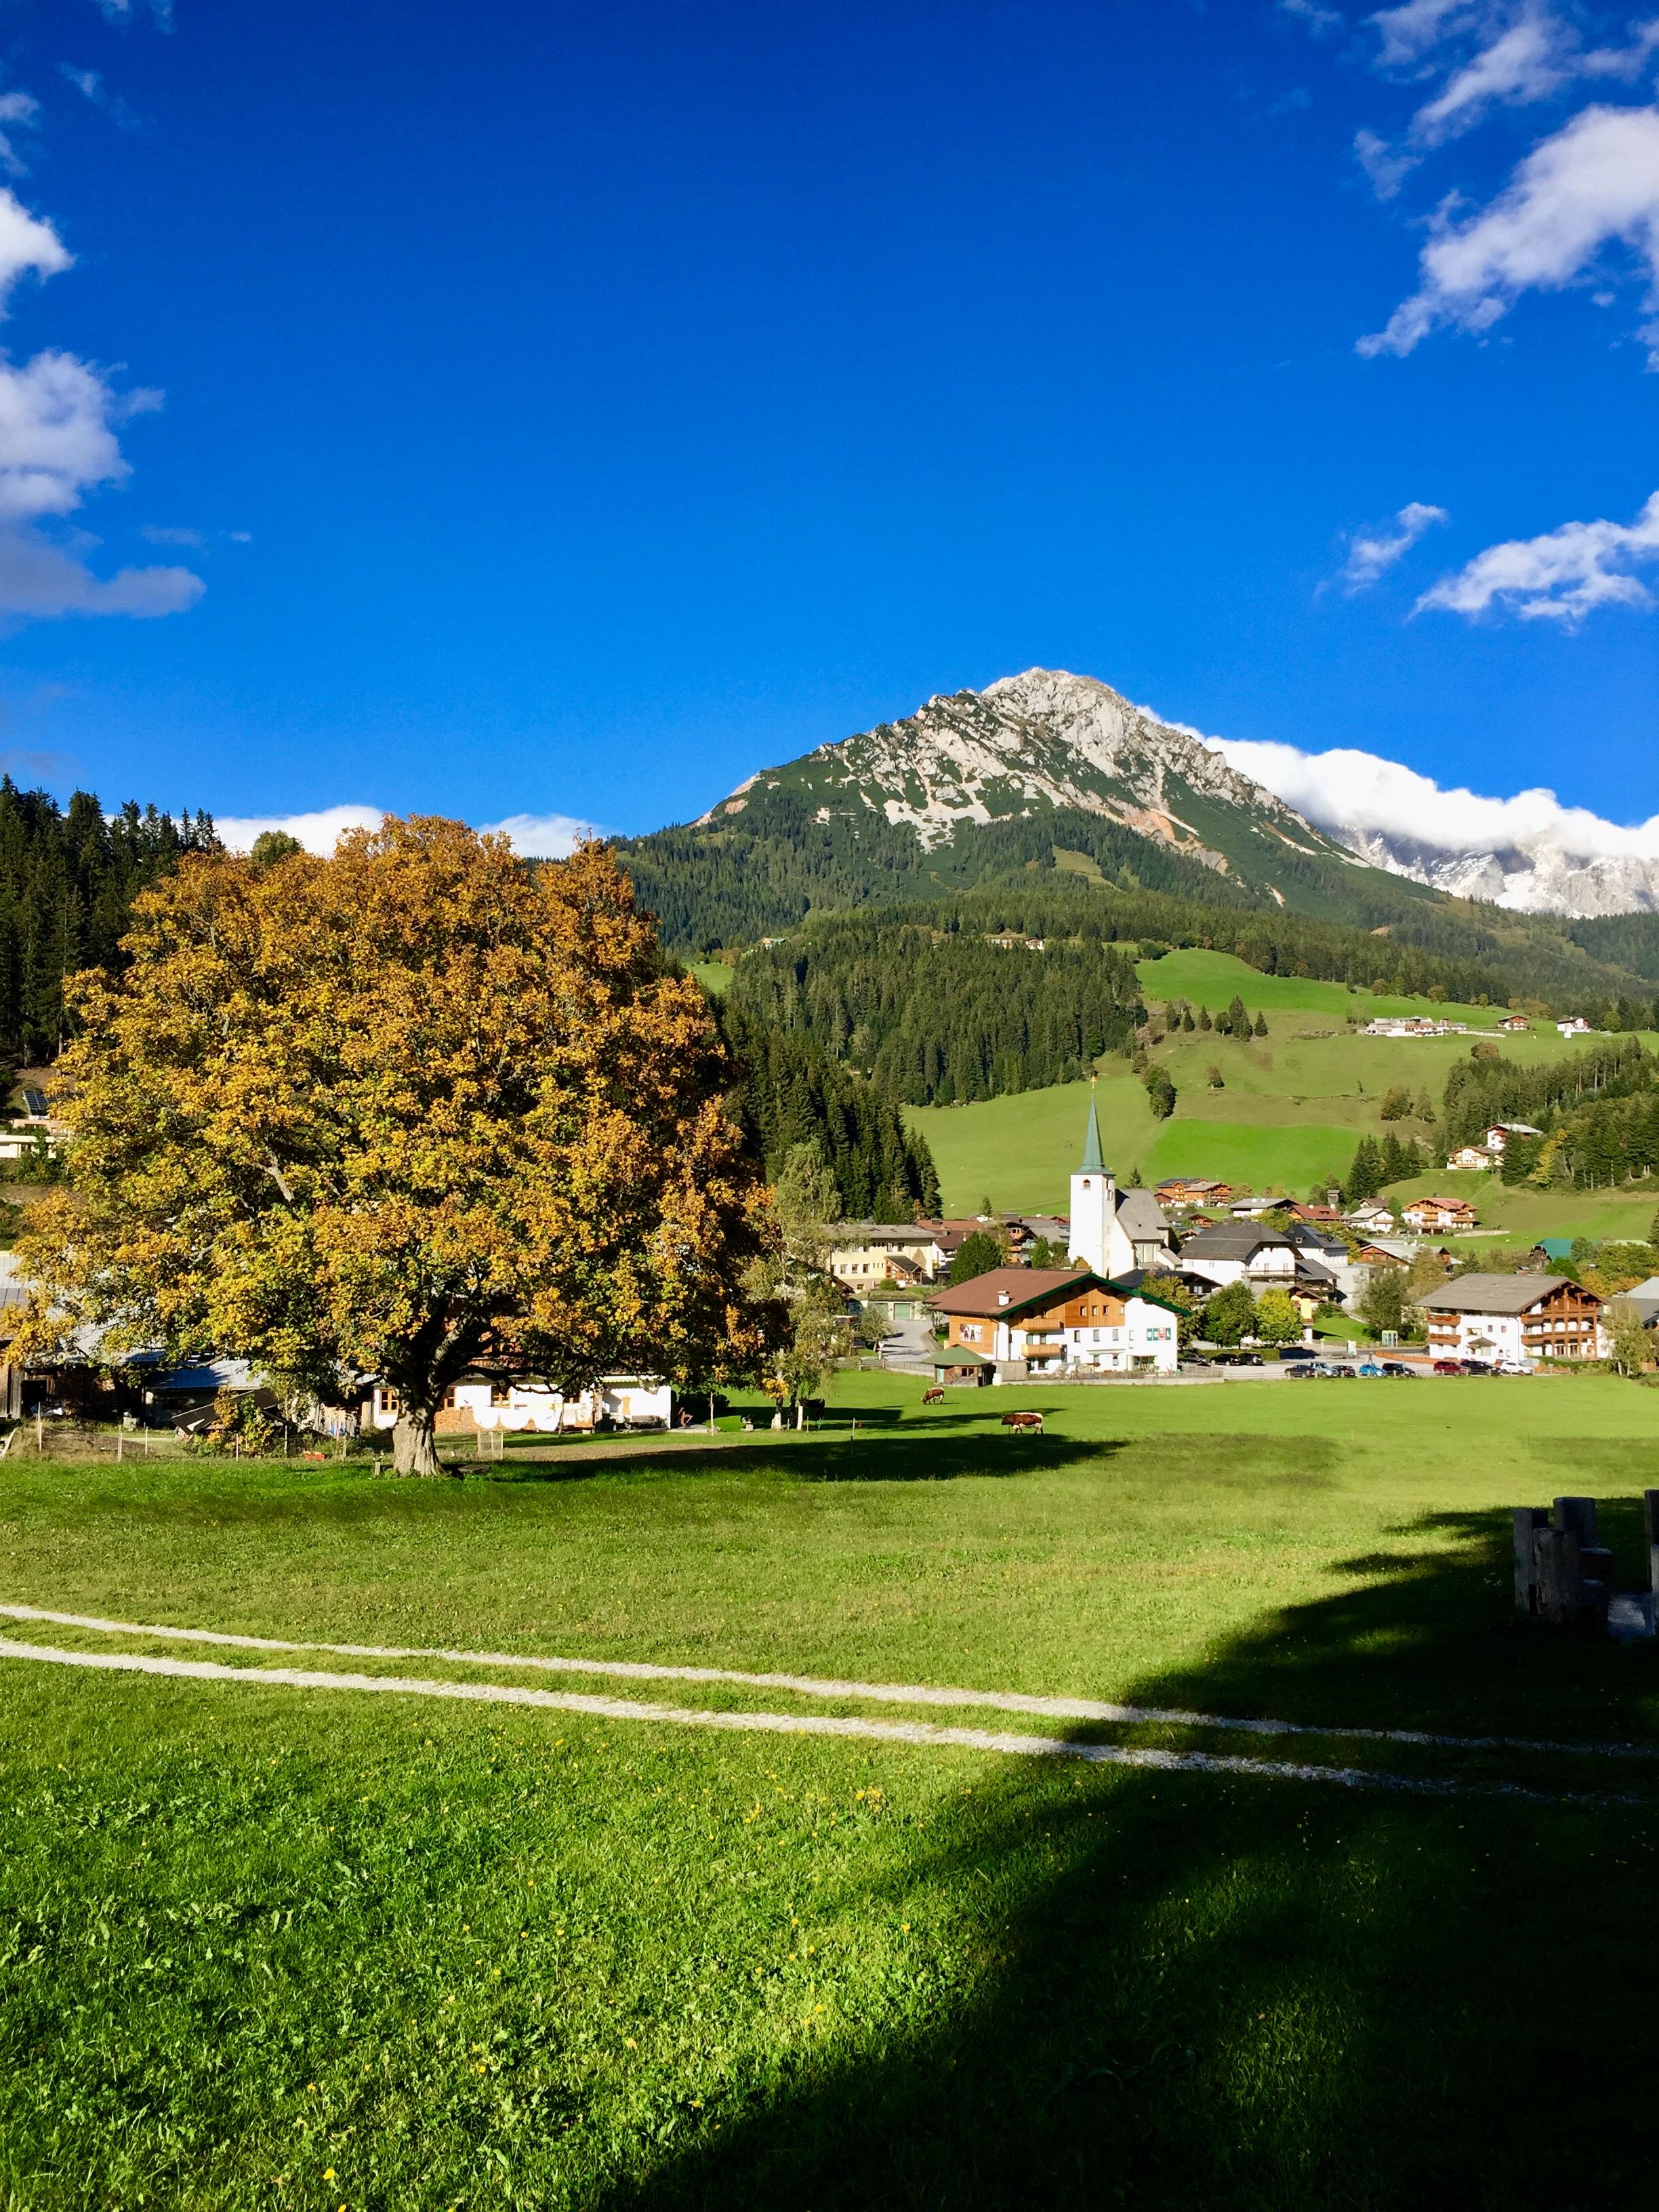 Perfekte Herbstlandschaft in Filzmoos